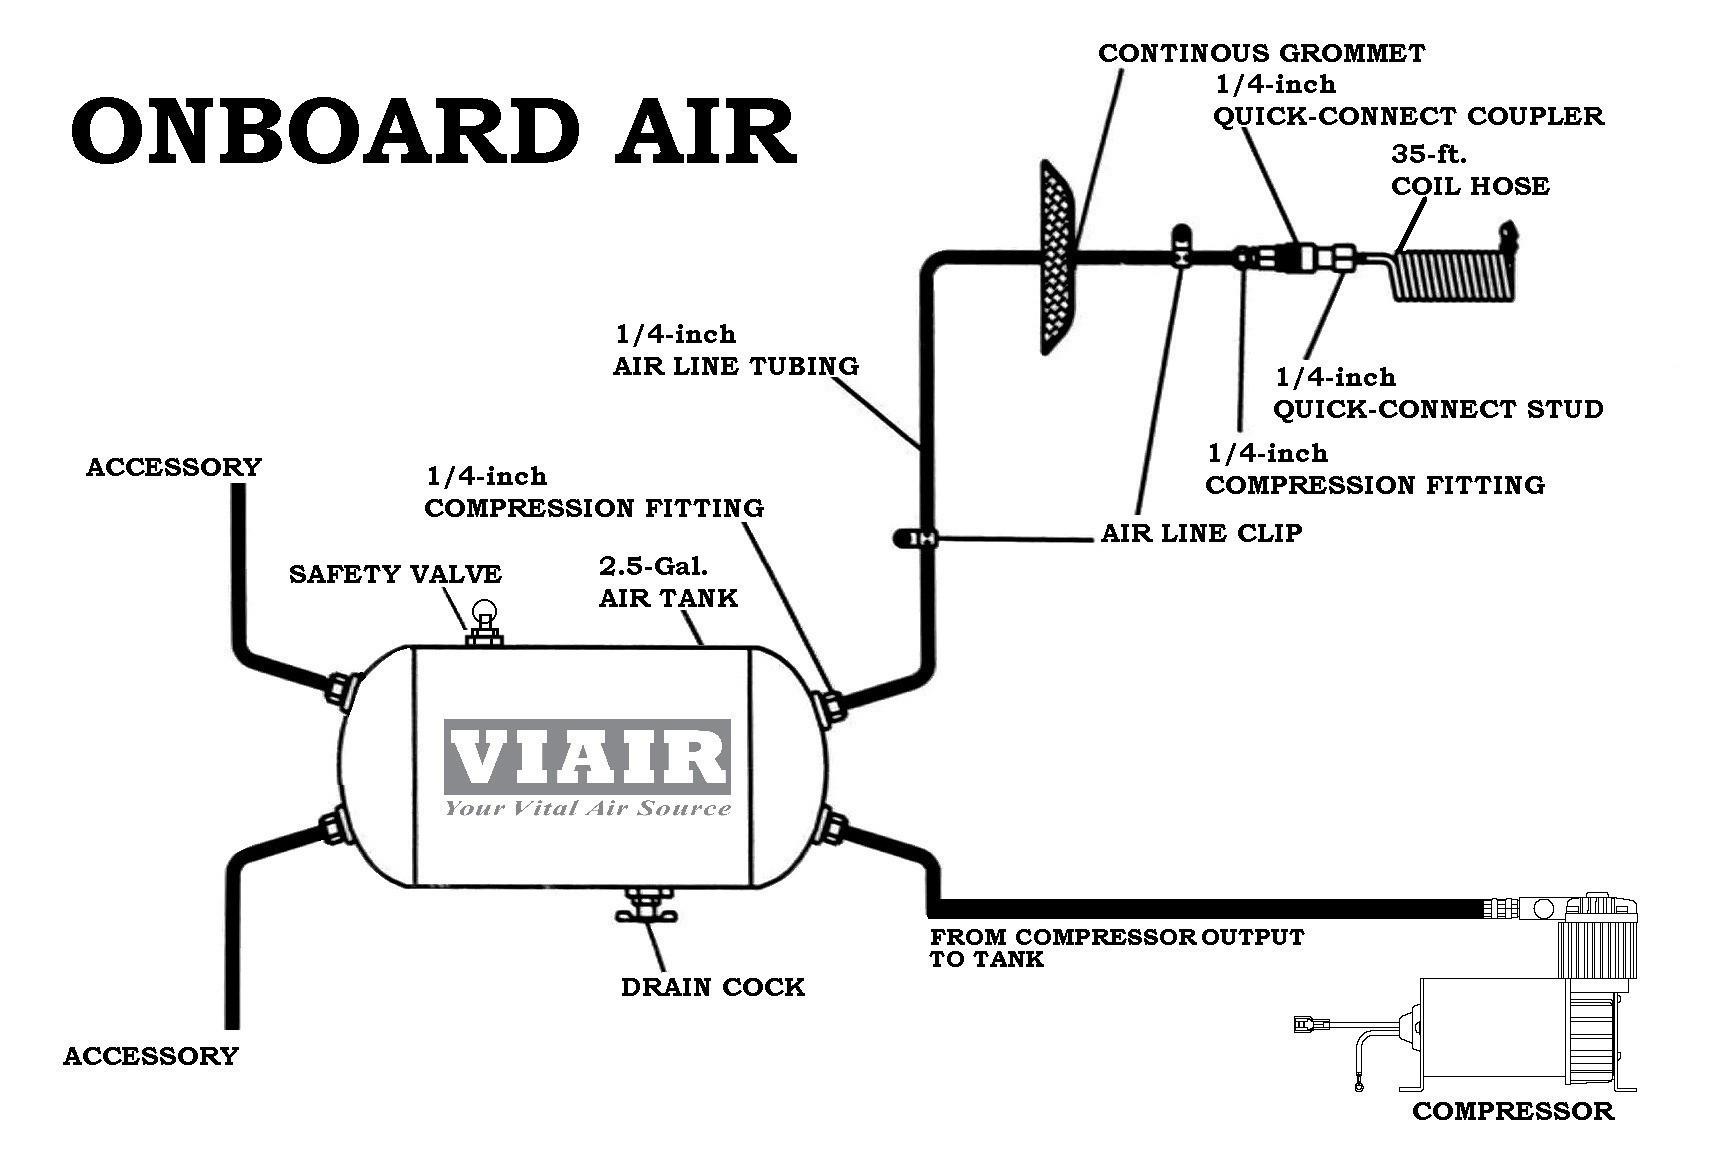 tank truck manufacturer air schematic - wiring diagram center bored-path -  bored-path.tatikids.it  tatikids.it